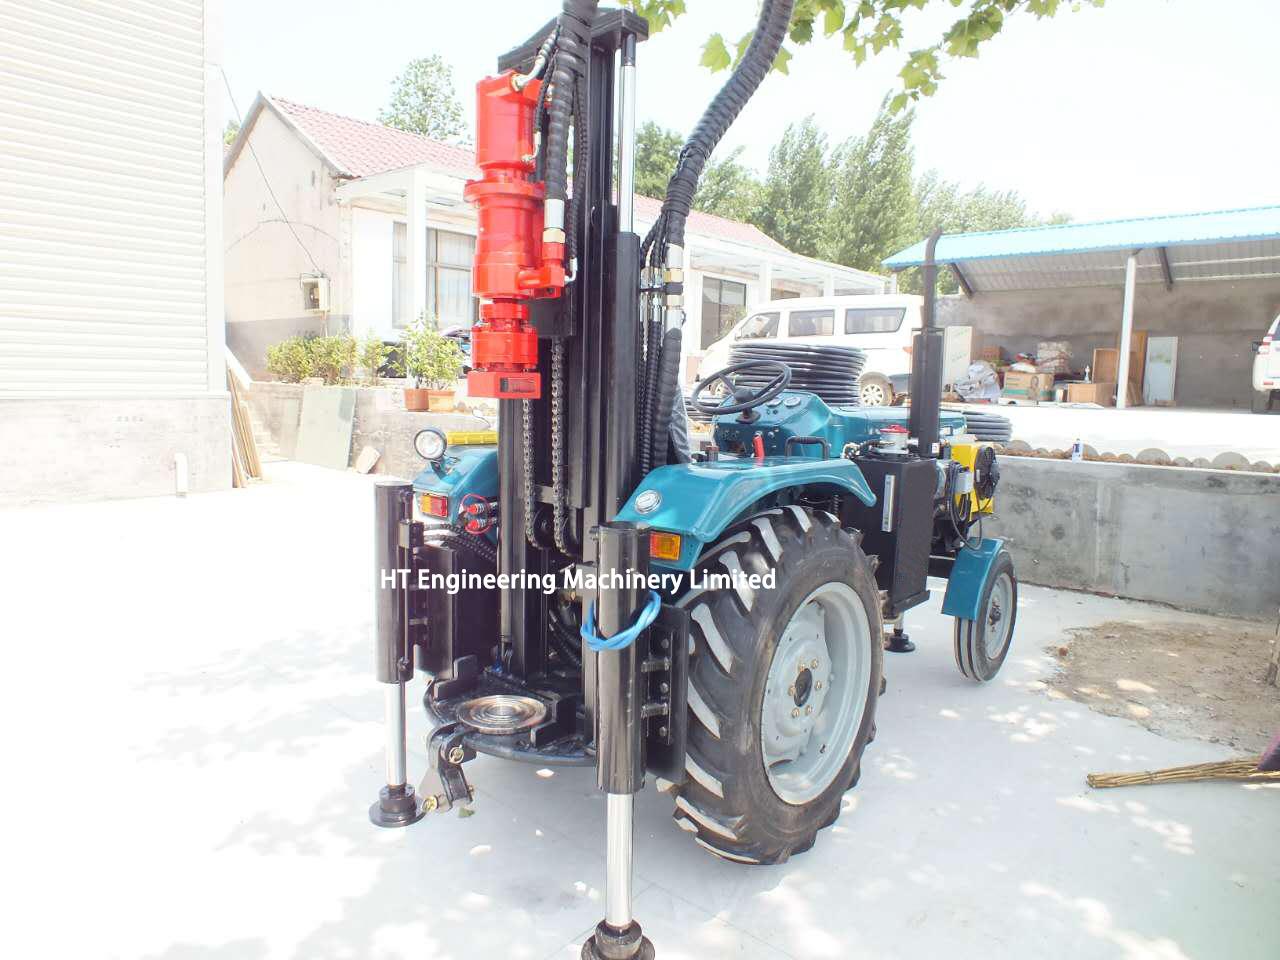 New Designed Special For Rock Air Compressor Drilling Machine